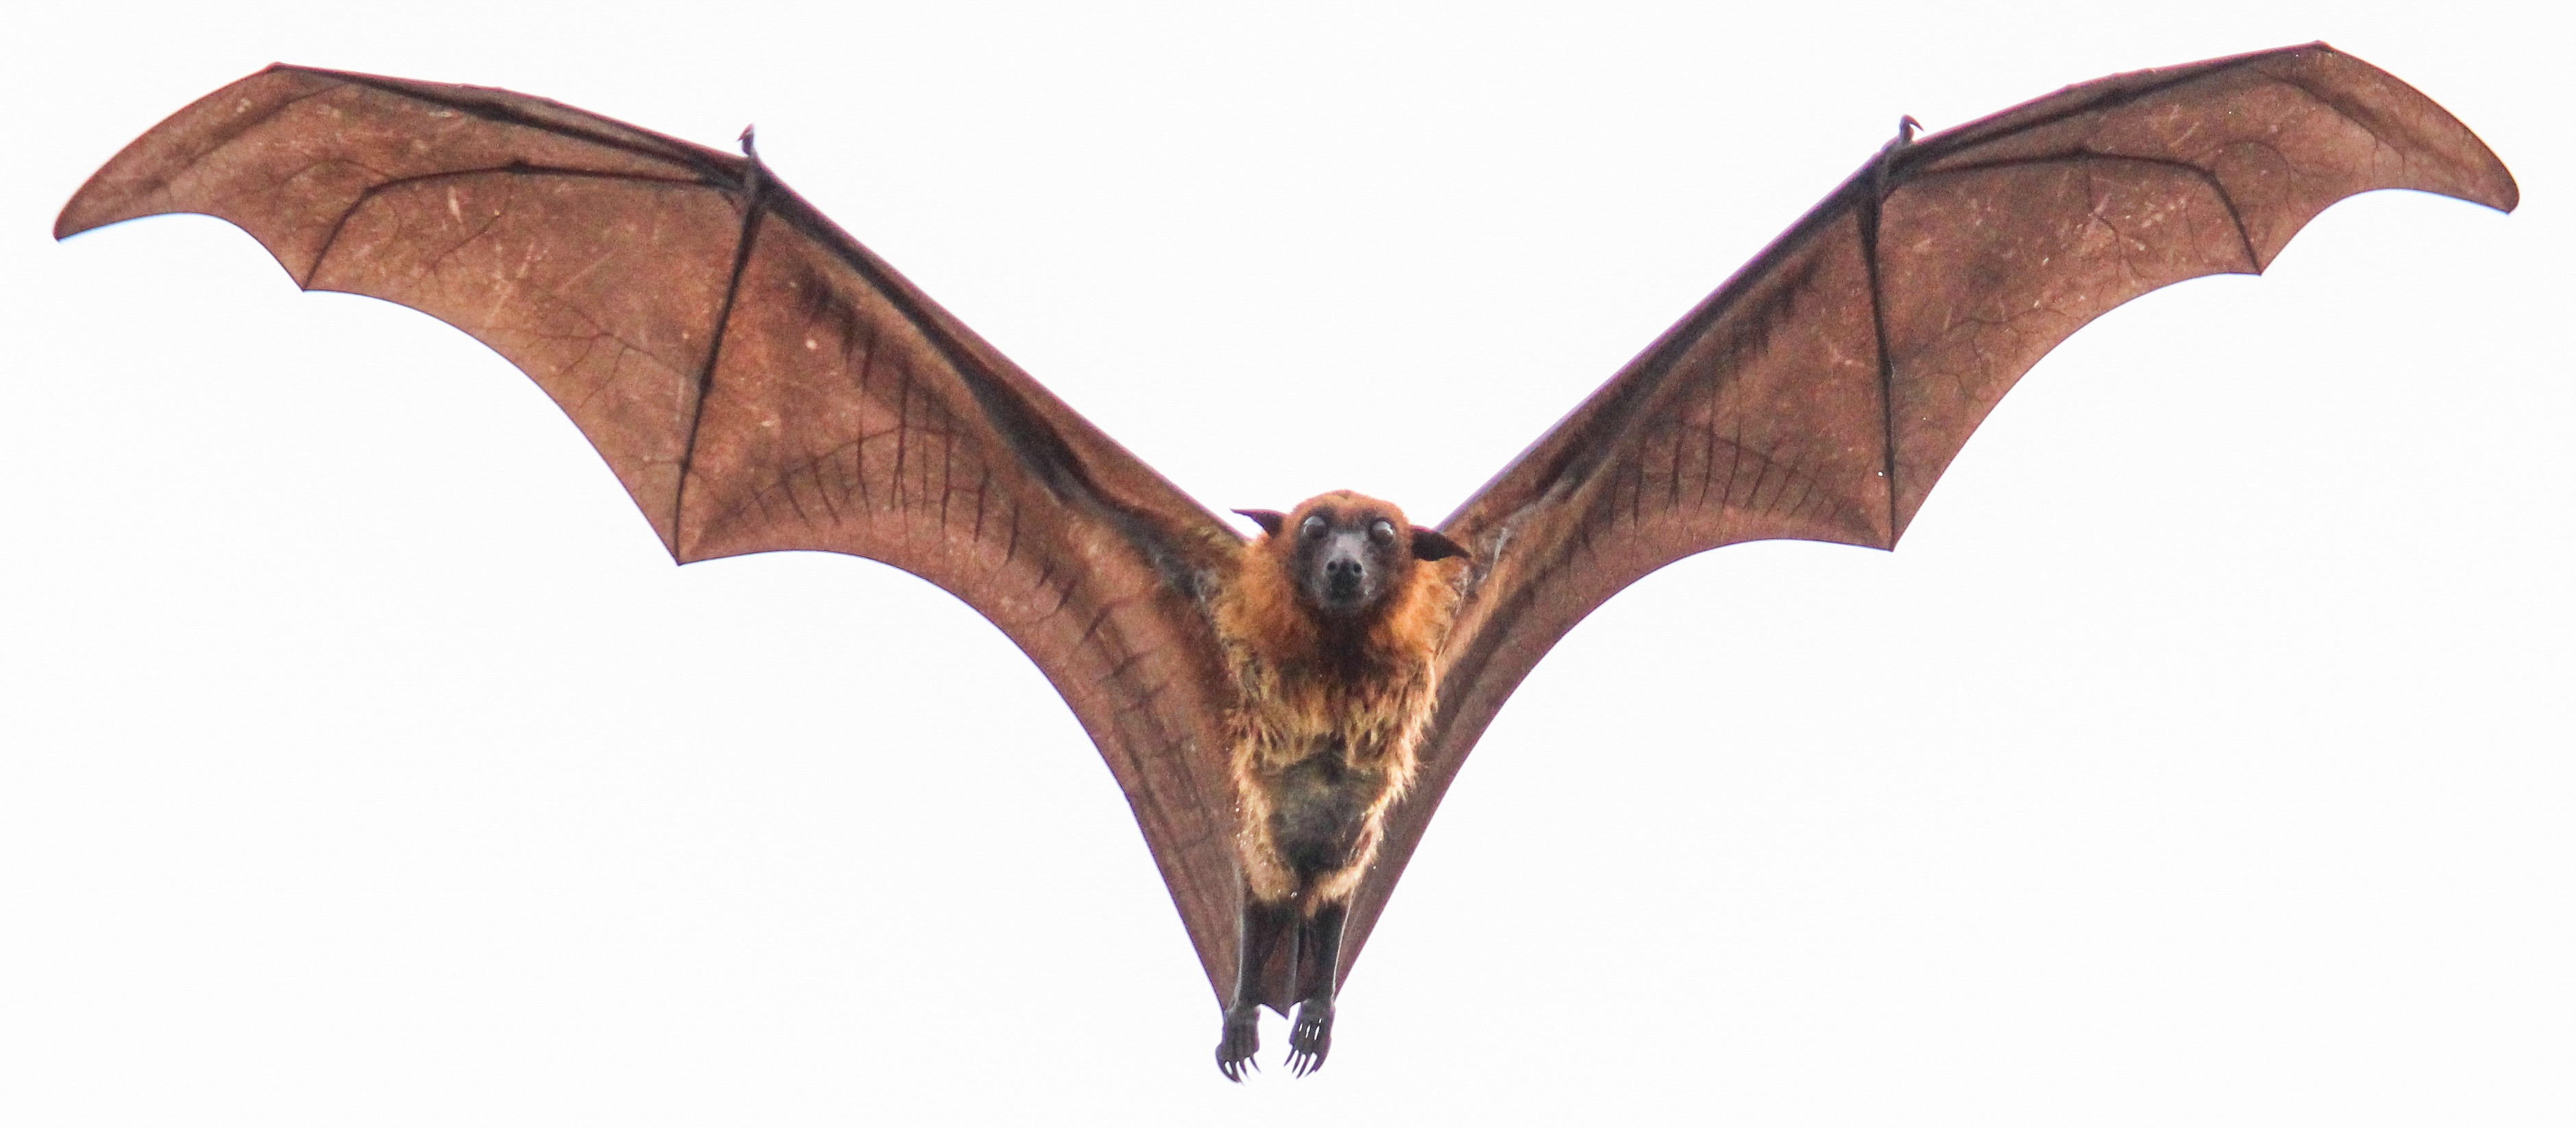 A Greater Indian fruit bat in flight. Credit: Trikansh sharma/Wikimedia Commons, CC0